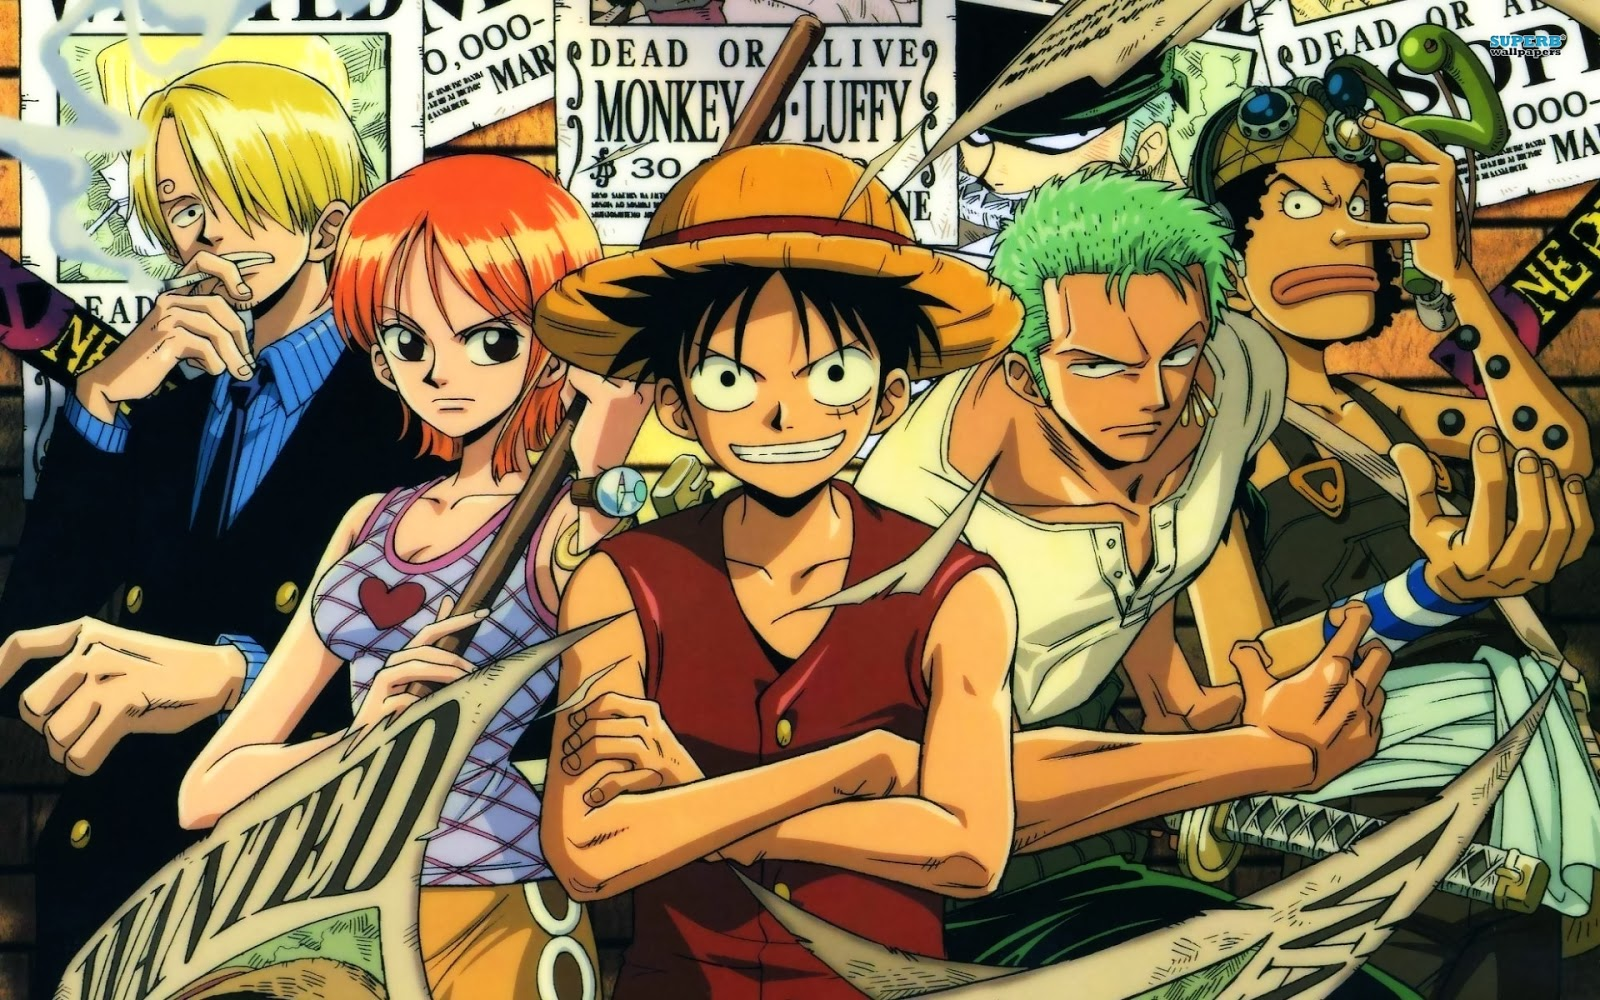 One Piece Episode 631 Subtitle Indonesia   OFGAMESOFTWARE